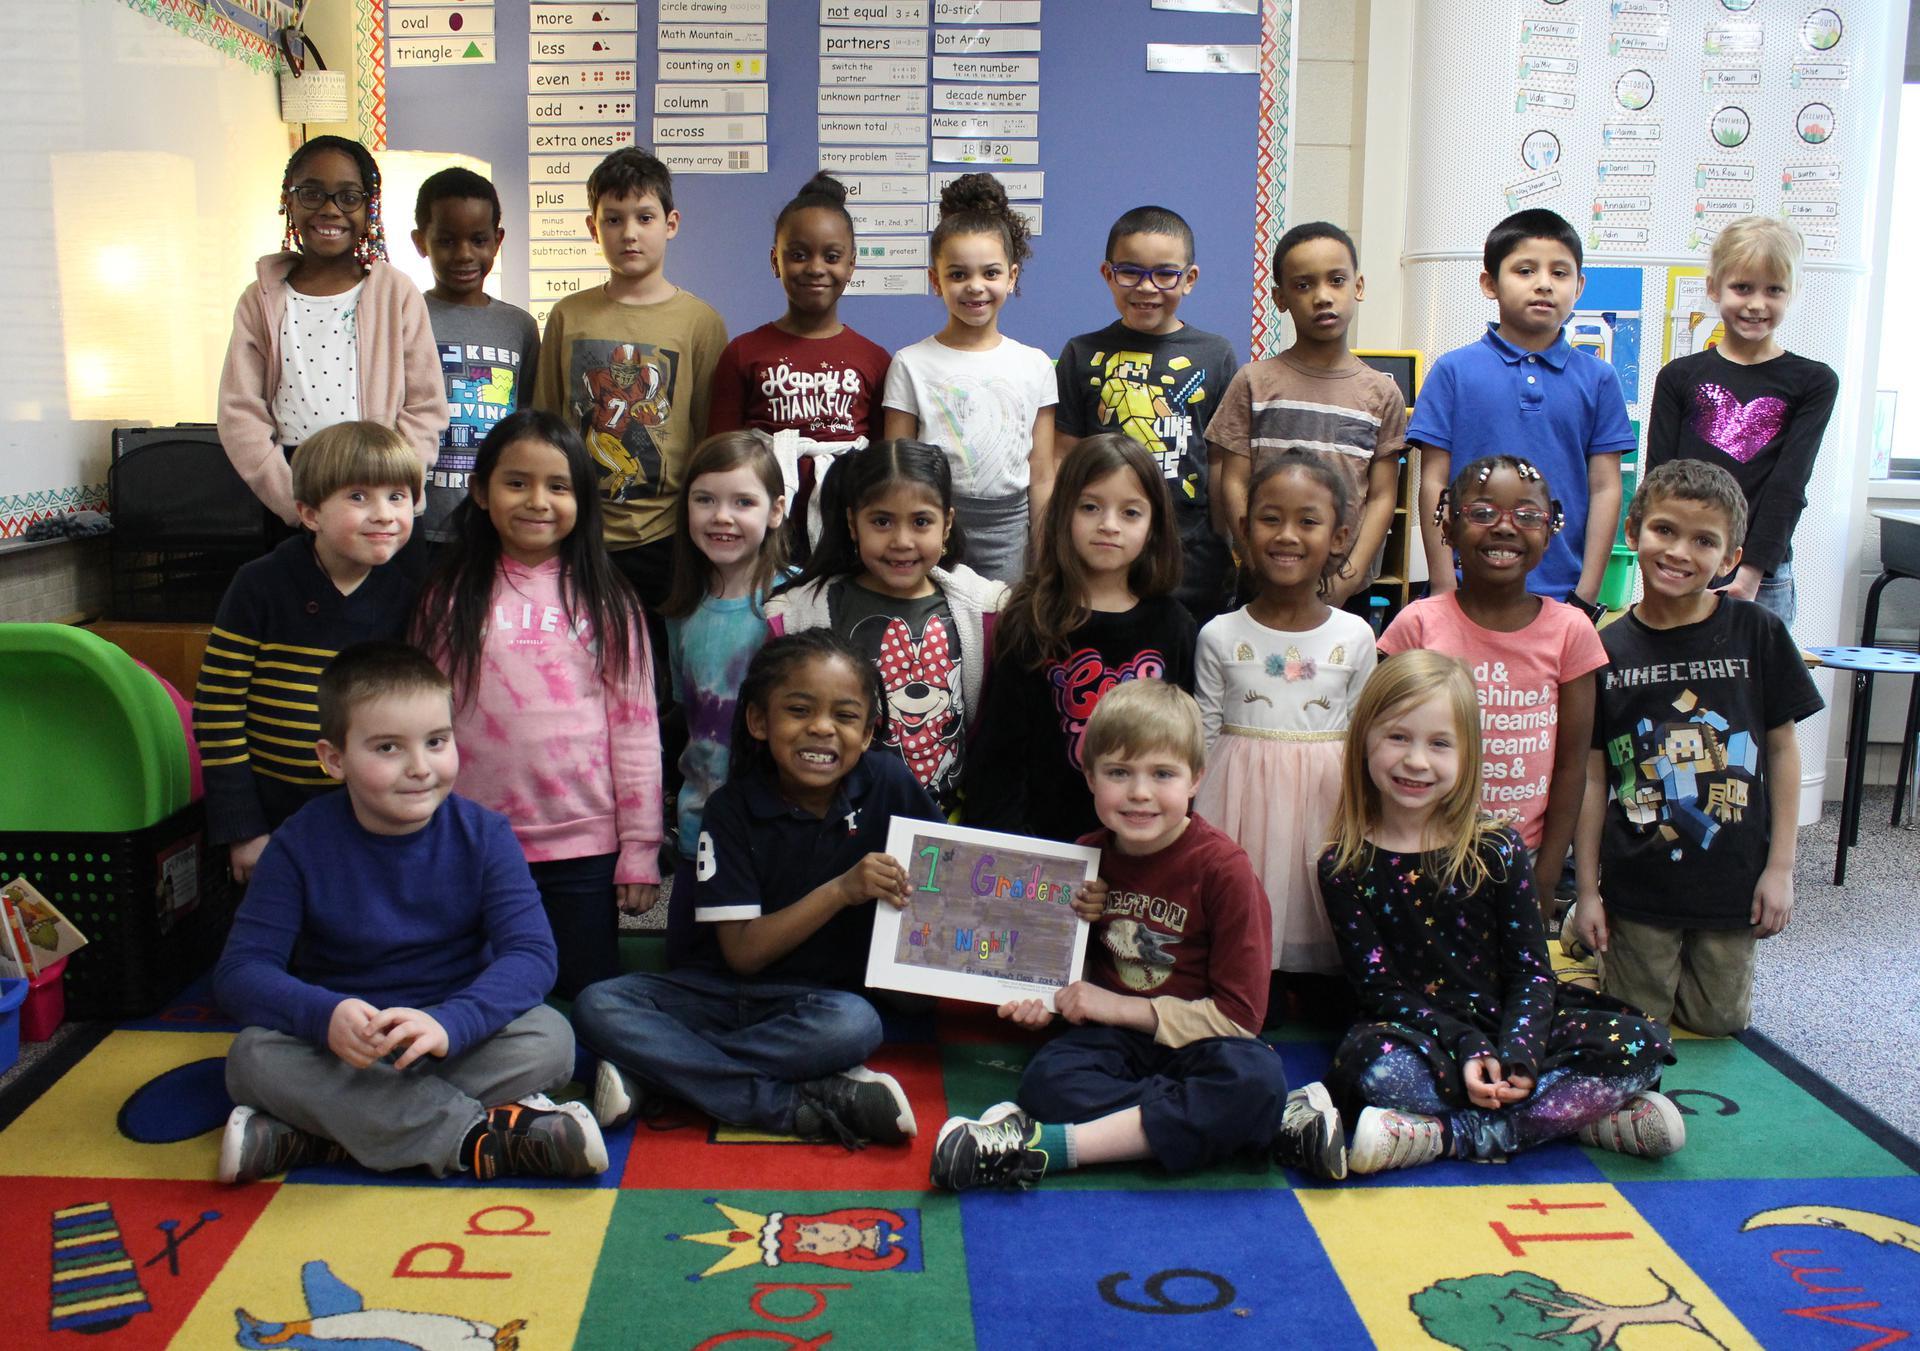 Stevenson Elementary 1st grade class publishes story book